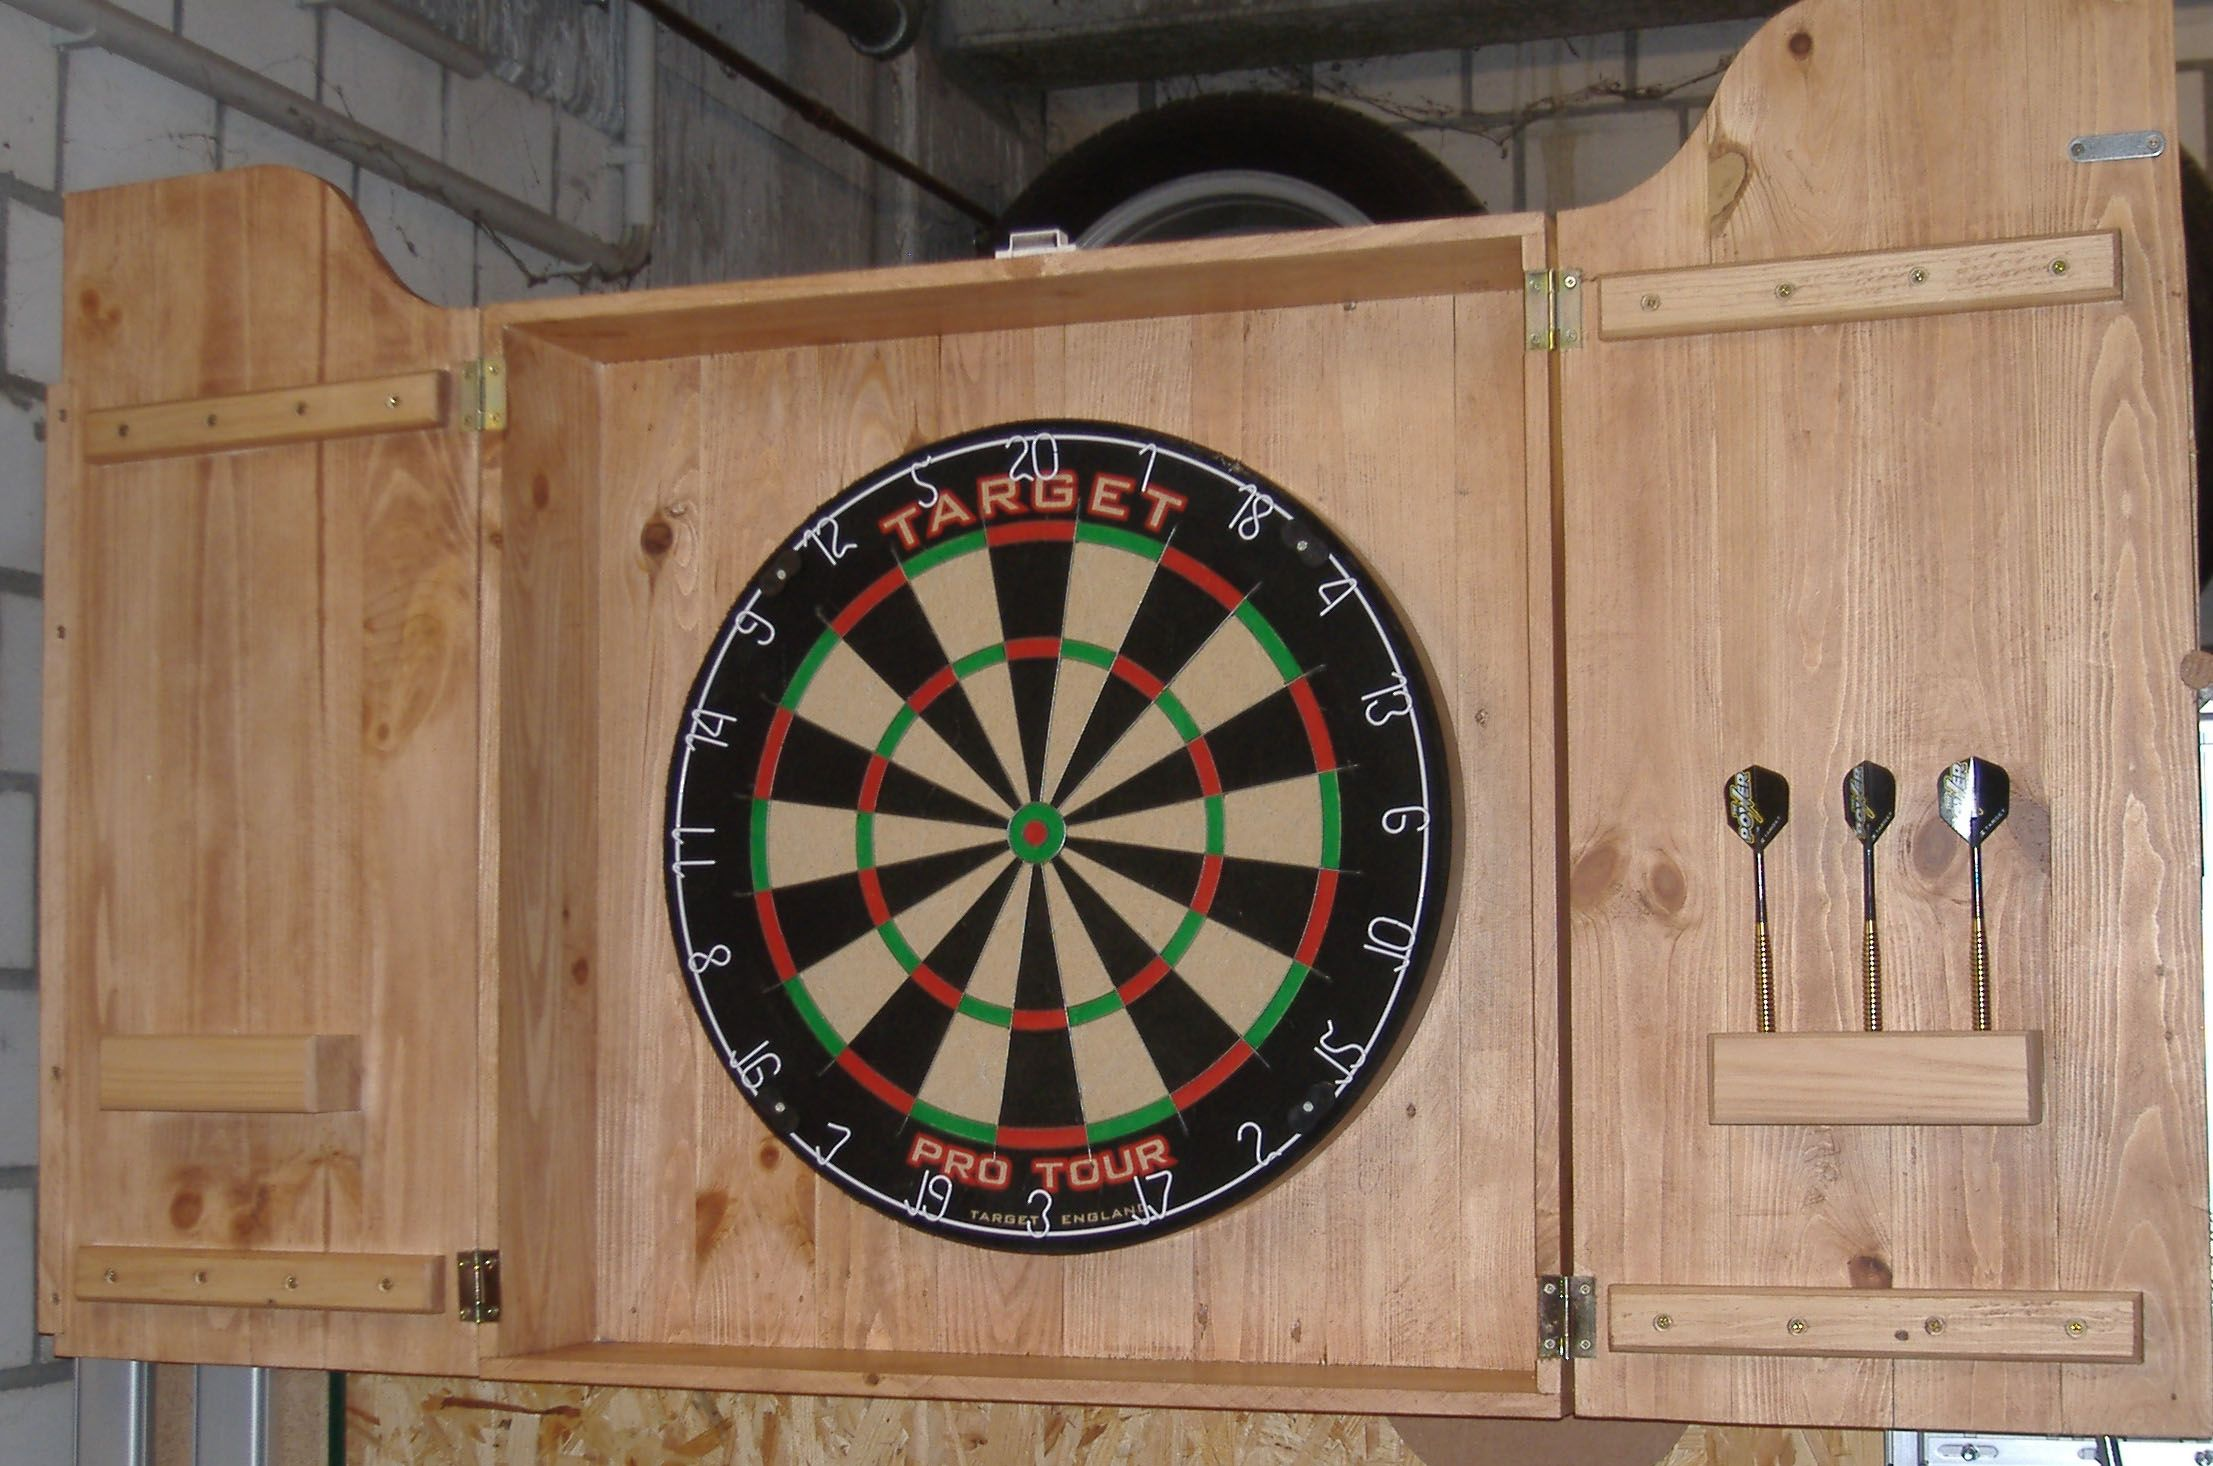 Dartboardschrank Aus Palettenholz Bauanleitung Zum Selber Bauen Palettenholz Bauen Mit Holz Palette